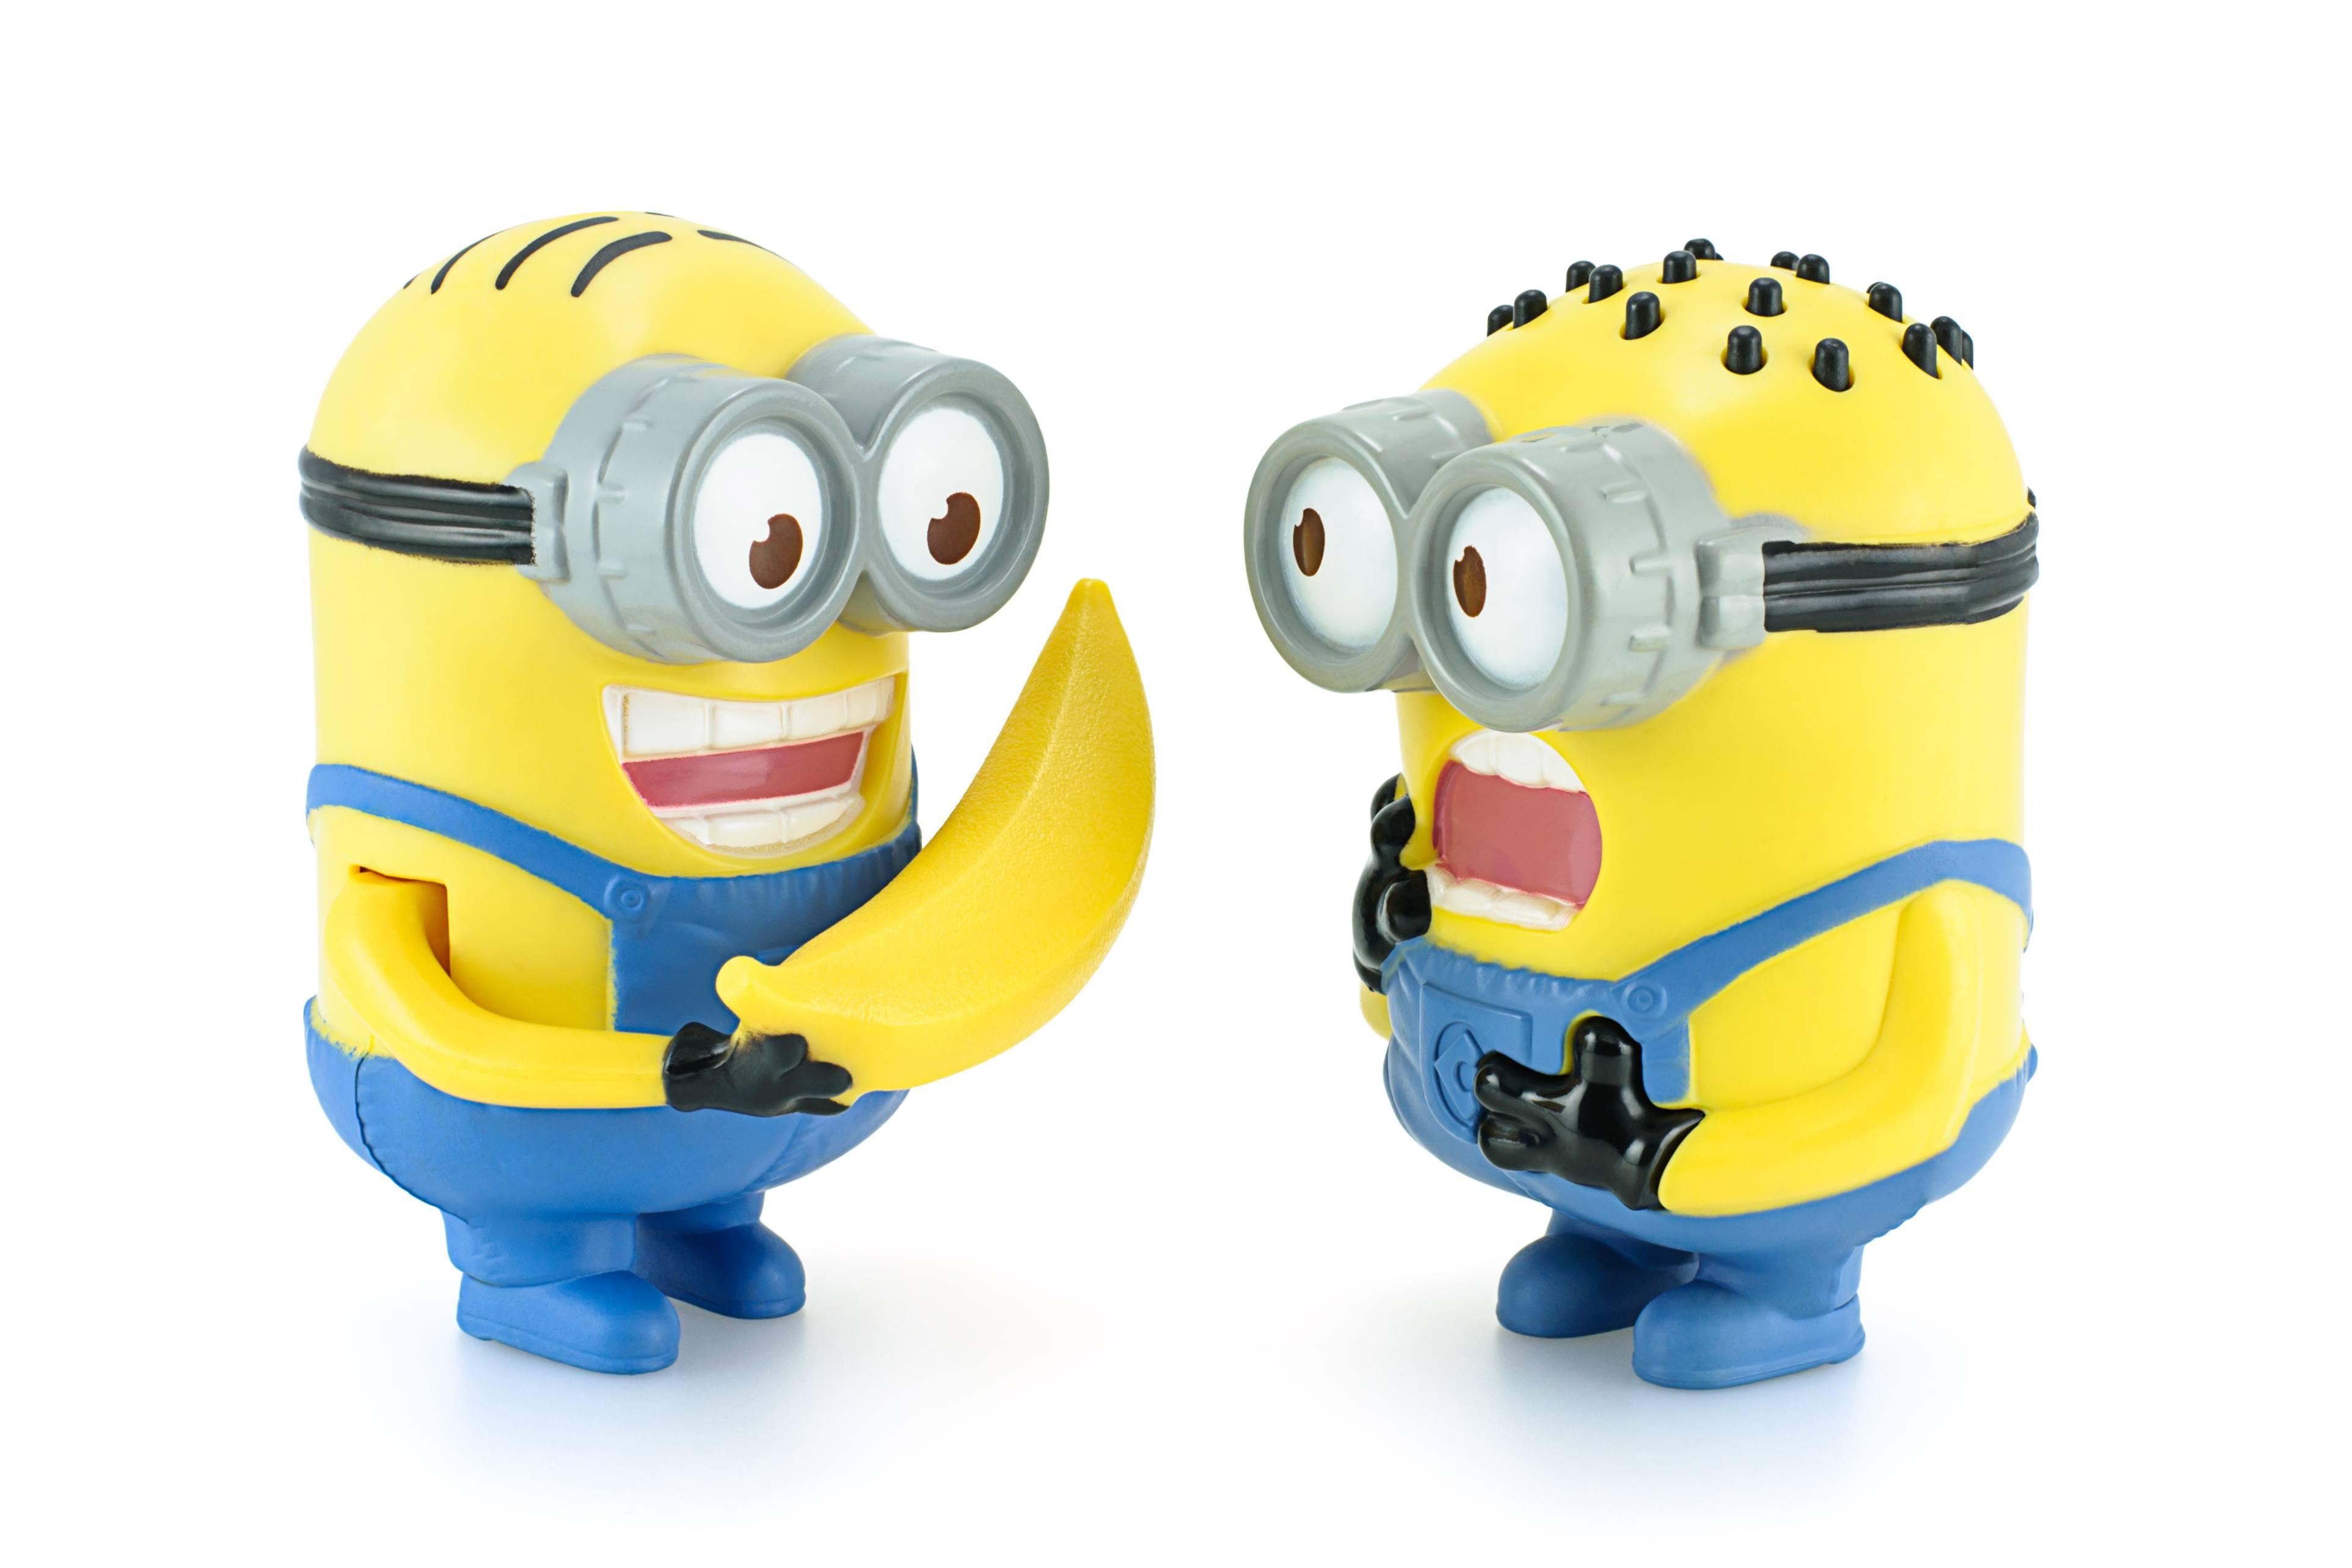 Minion McDonald's toy